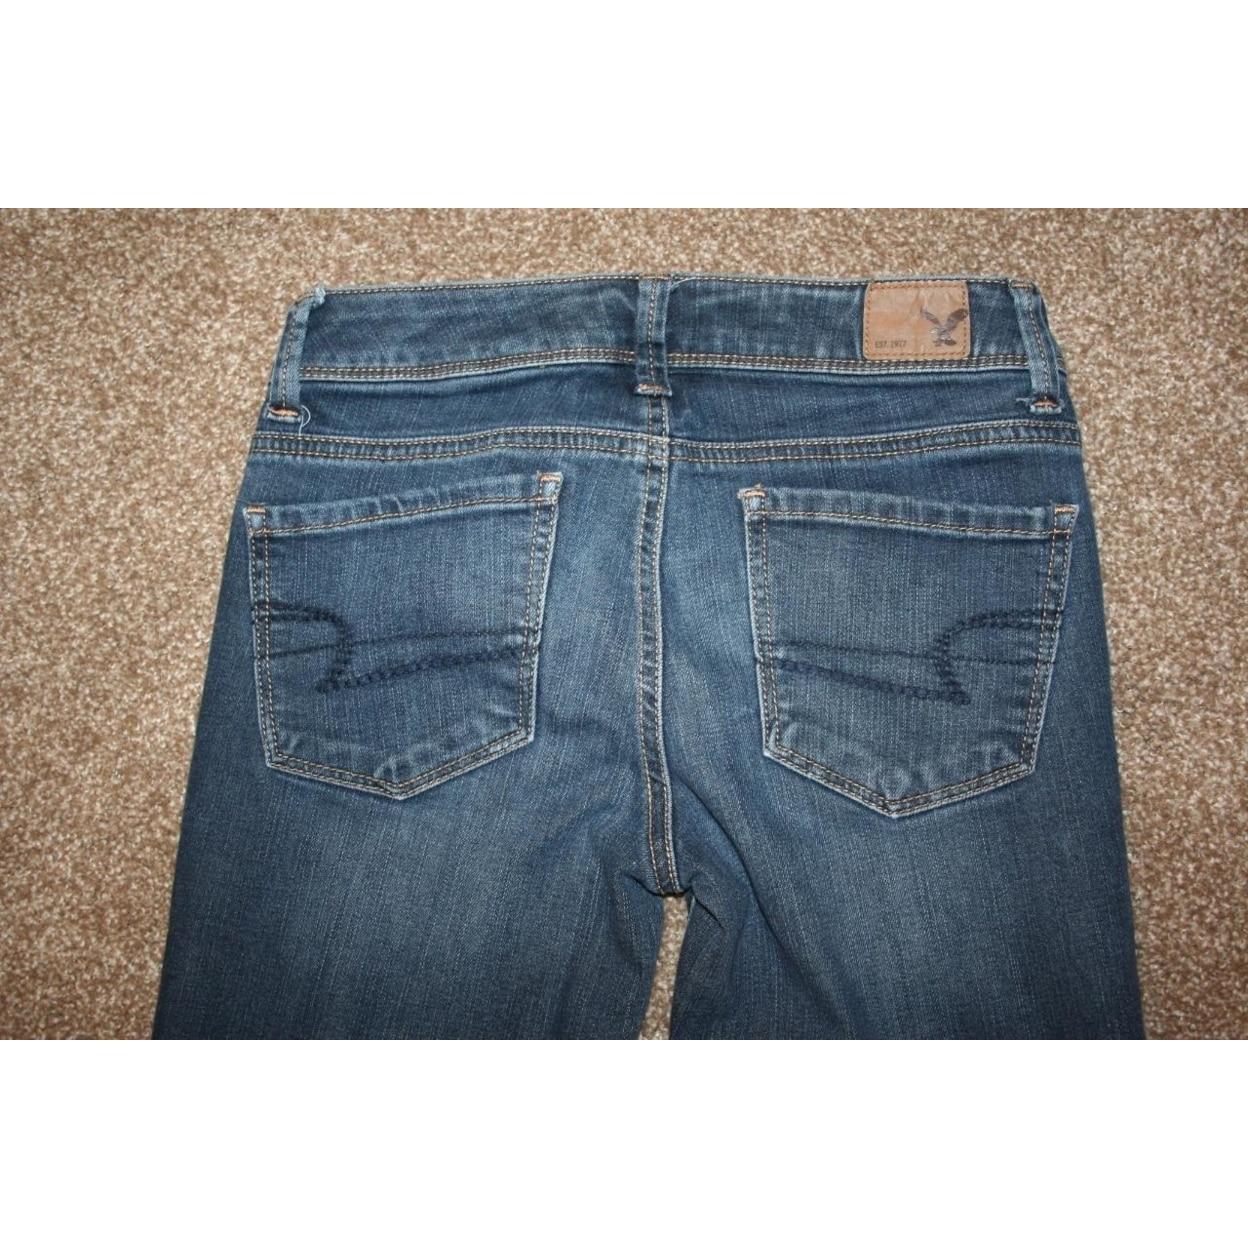 American Eagle Super Skinny Jeans 00 Short Stretch 25 X 26 Womens Jeans Aliexpress